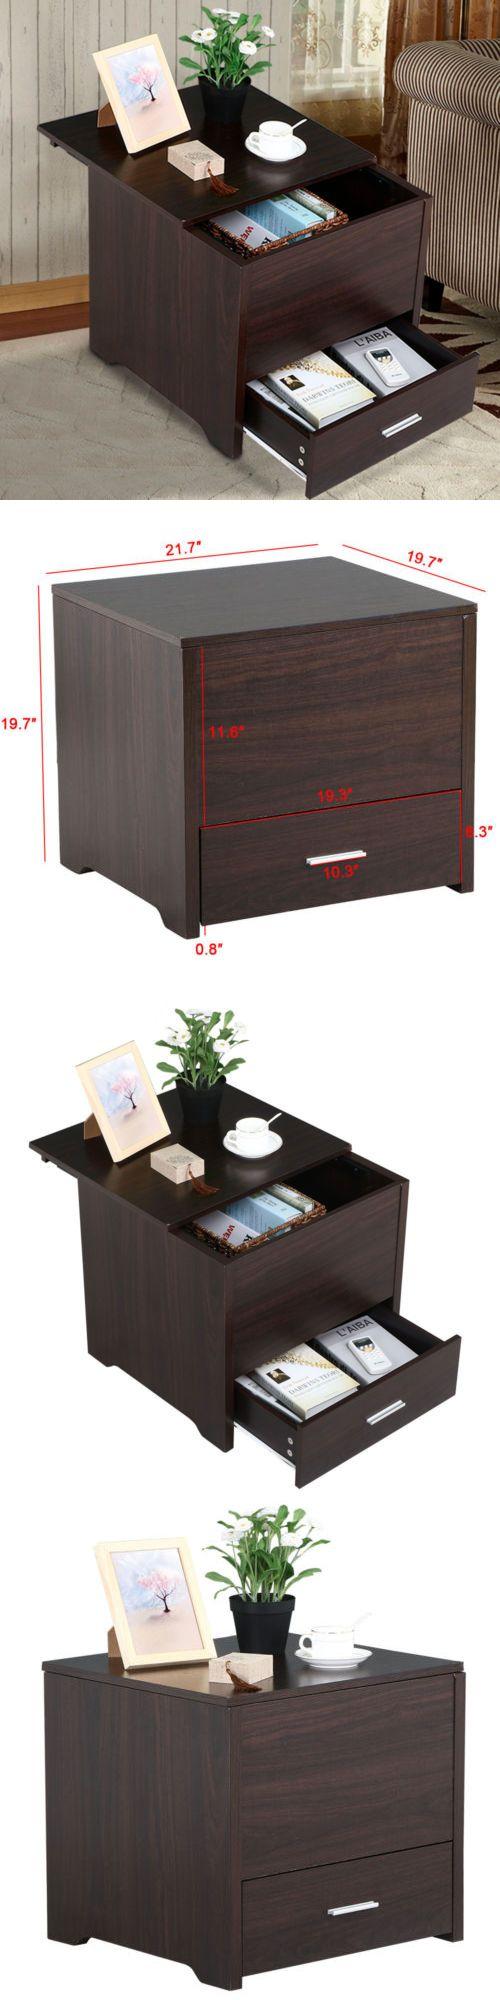 Bedside table decor pinterest - Nightstands 38199 Espresso Nightstand Bedside End Table Night Stand Bedroom Furniture Buy It